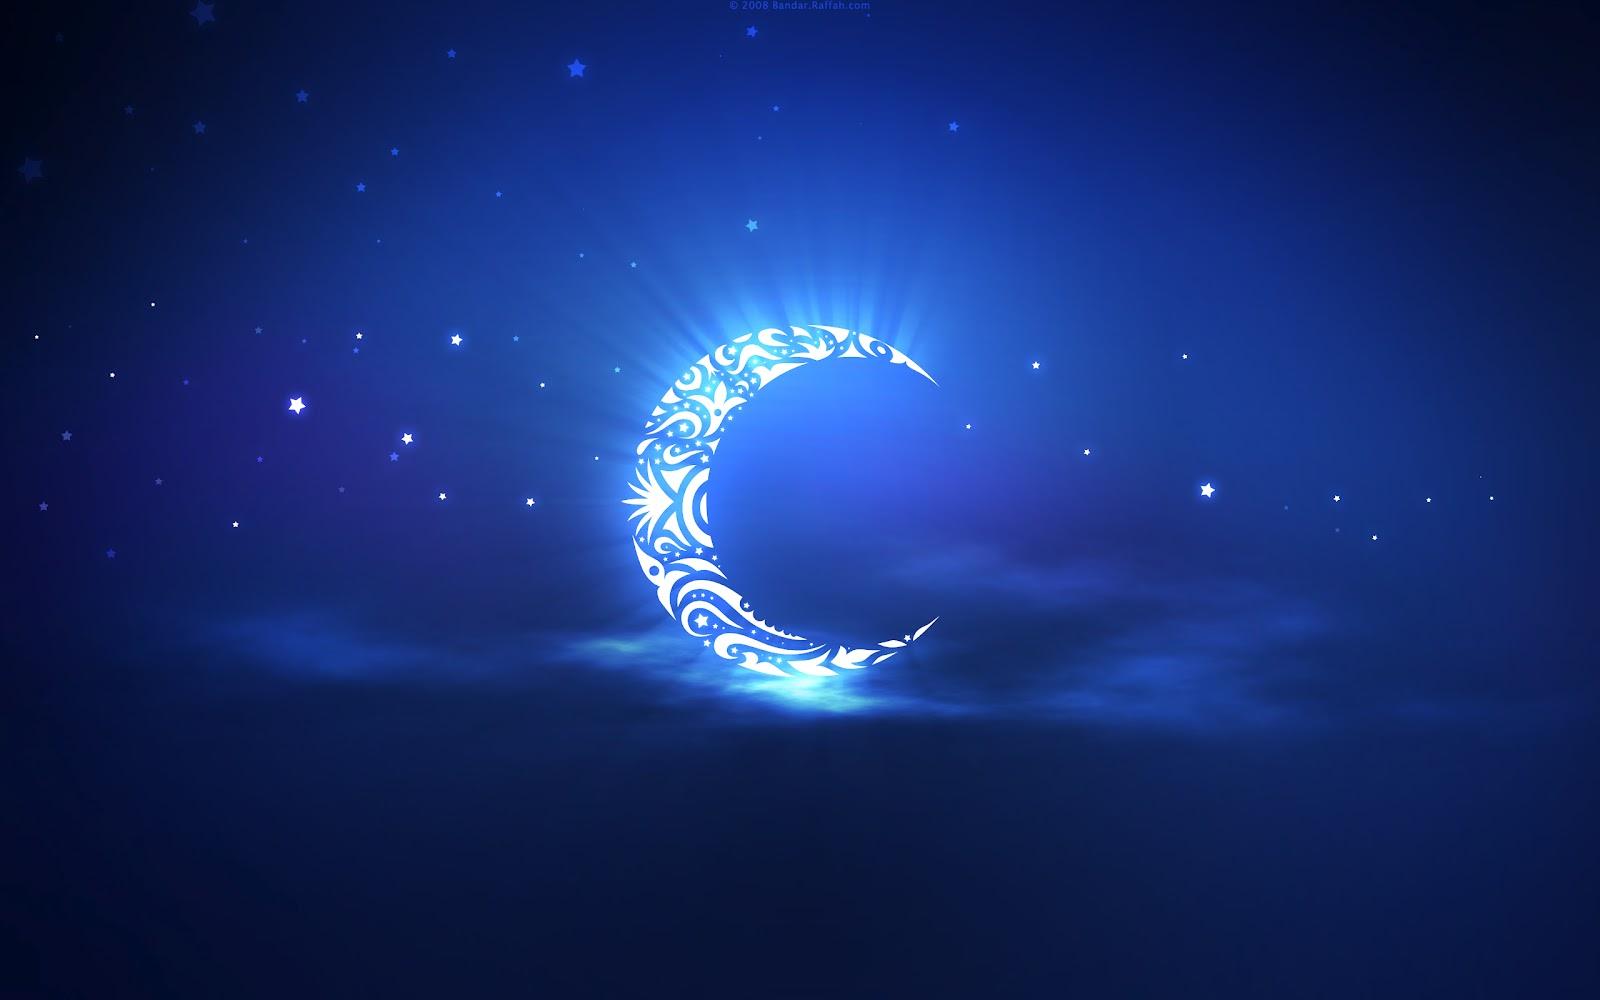 http://4.bp.blogspot.com/-2KWKoaJb0Wo/T_Kyqlohm6I/AAAAAAAAAFE/uUbjv6VICEY/s1600/08-ramadan-kareem-wallpaper.jpg